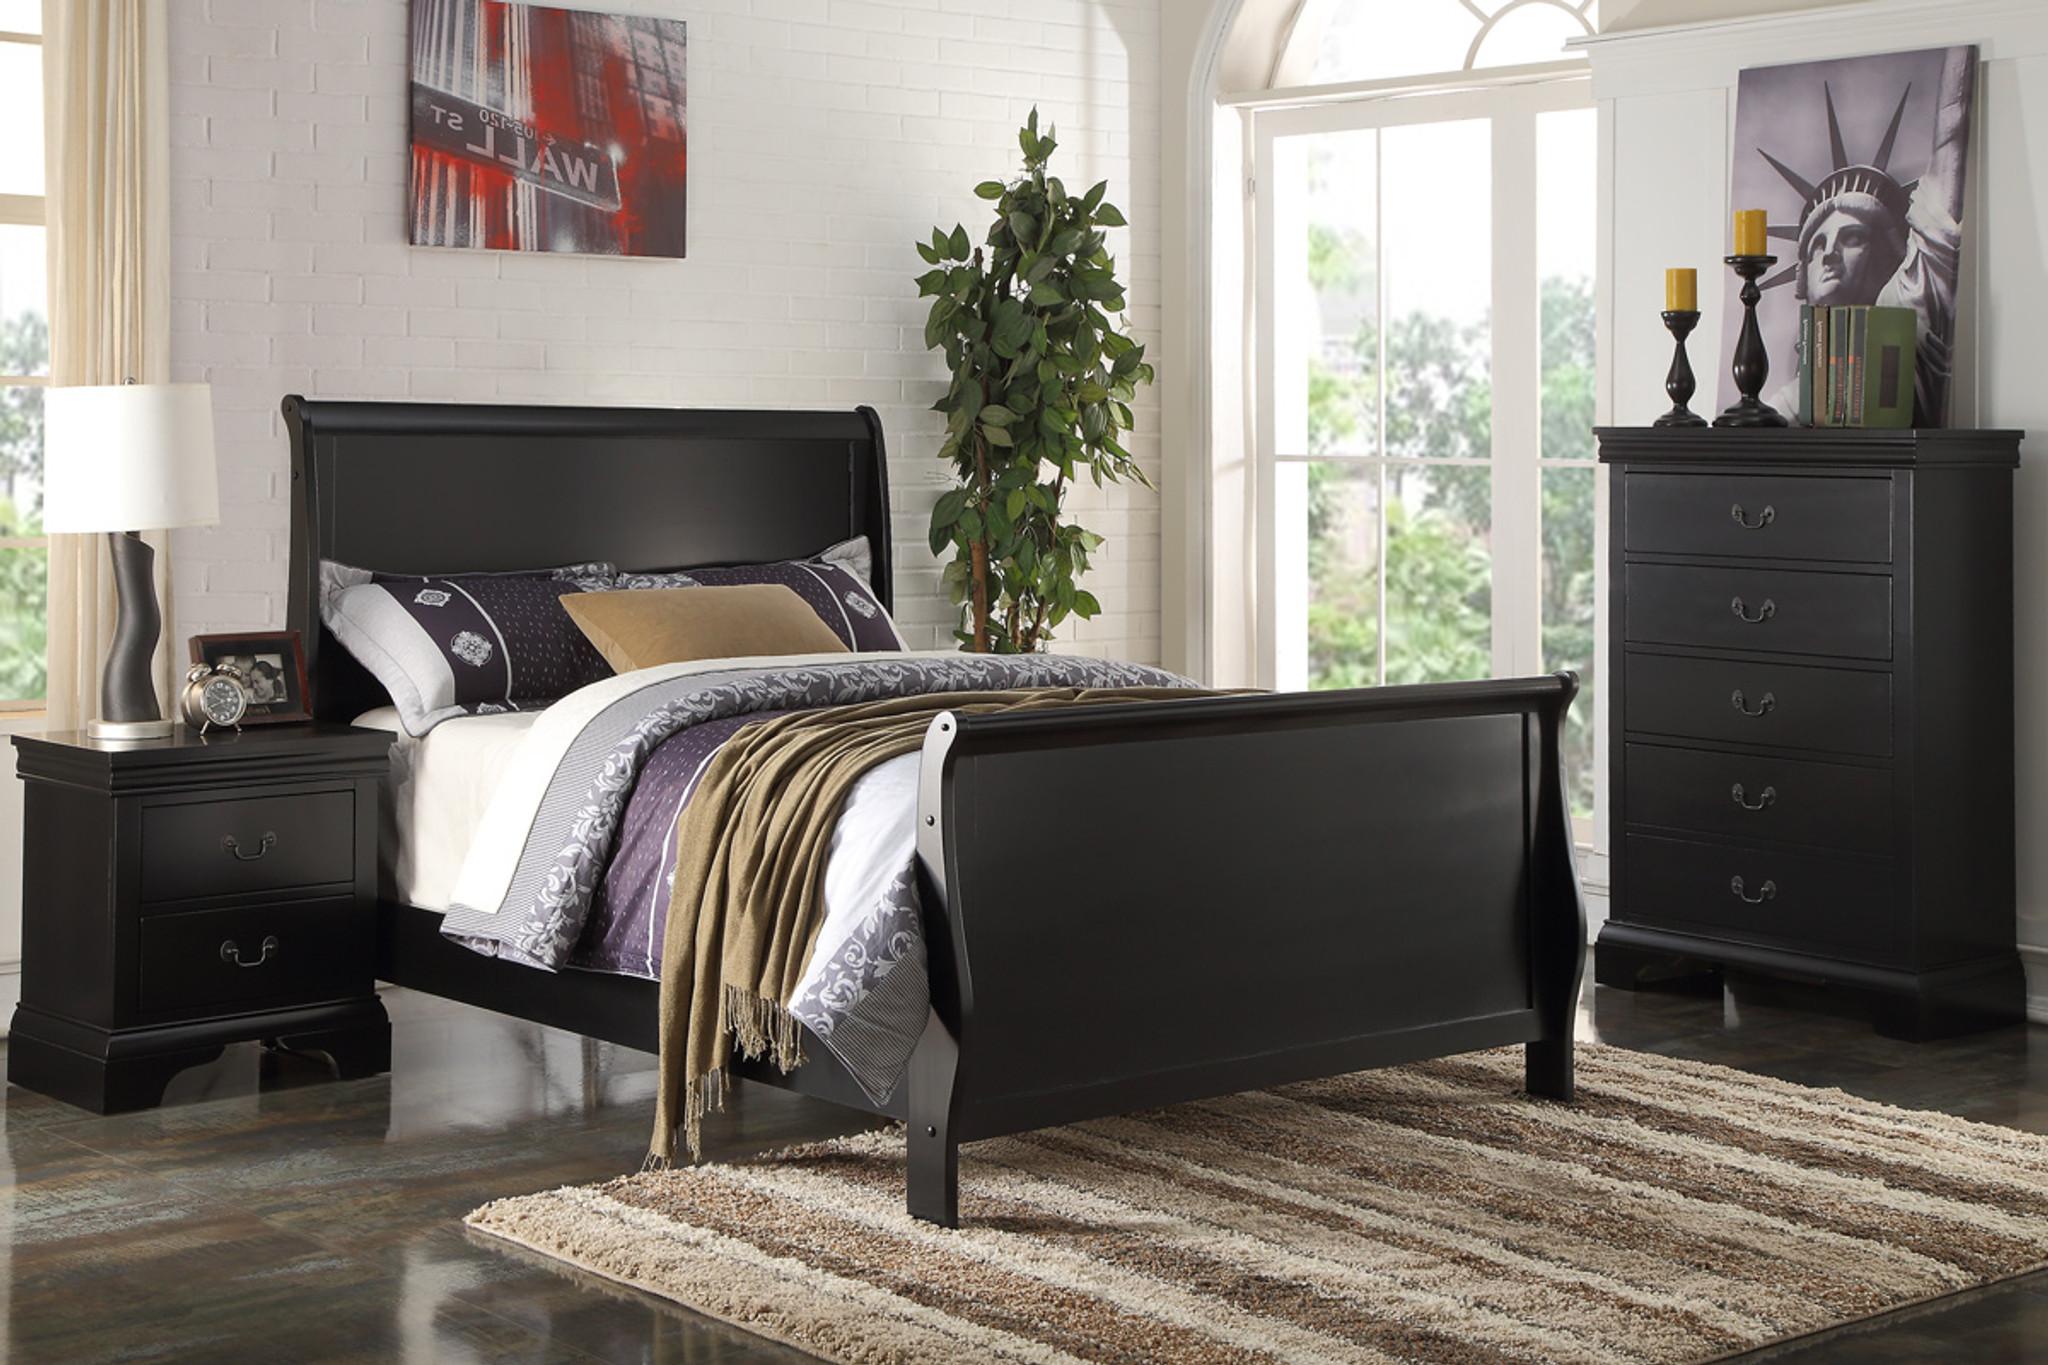 Kassa Mall Home Furniture F9230t F9230f Sleigh Design Black Twin Full Bed Frame